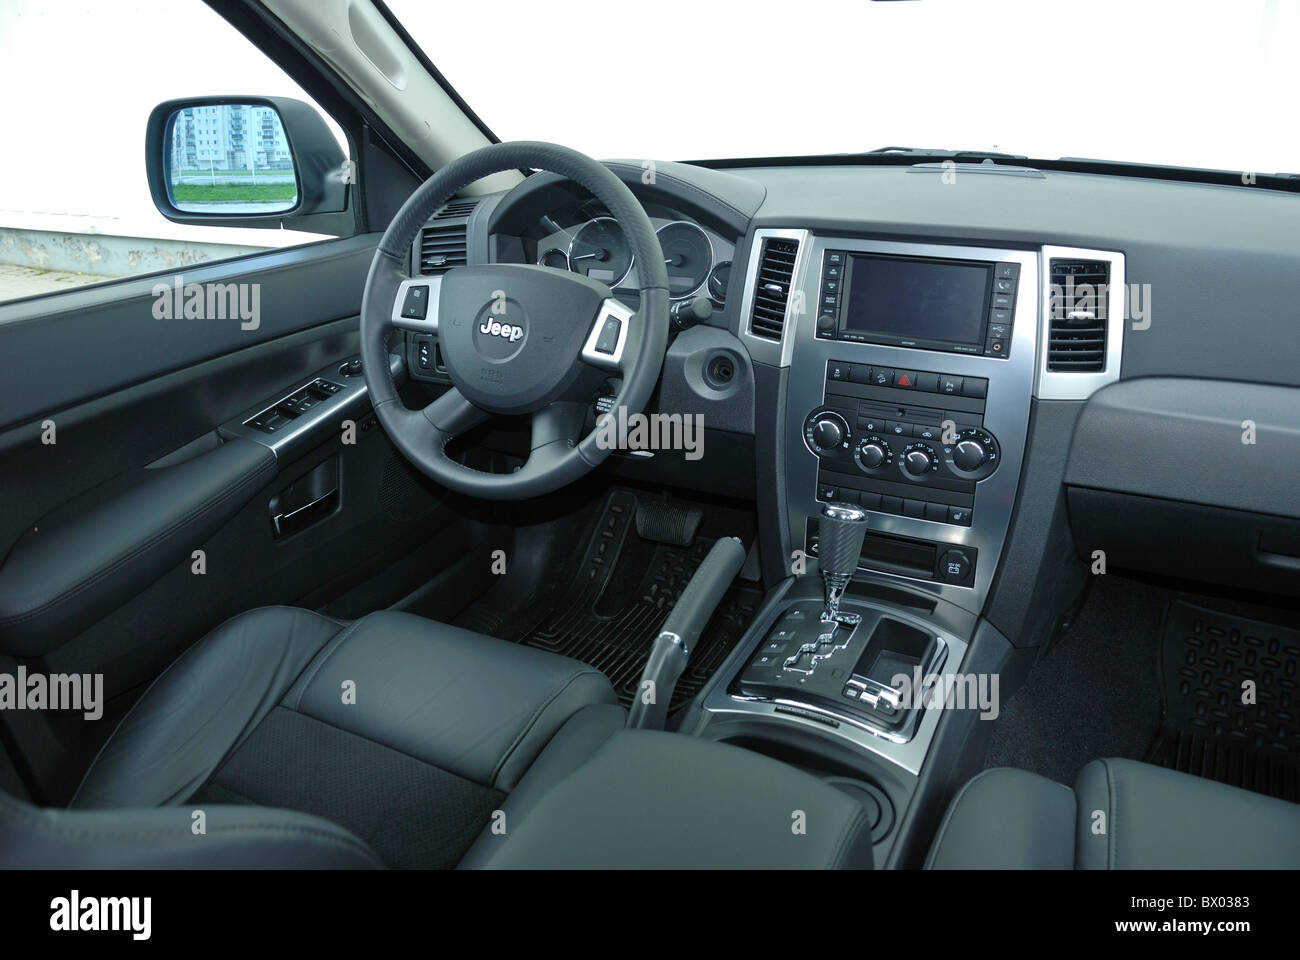 jeep grand cherokee 3 0 crd my 2005 wk us popular. Black Bedroom Furniture Sets. Home Design Ideas